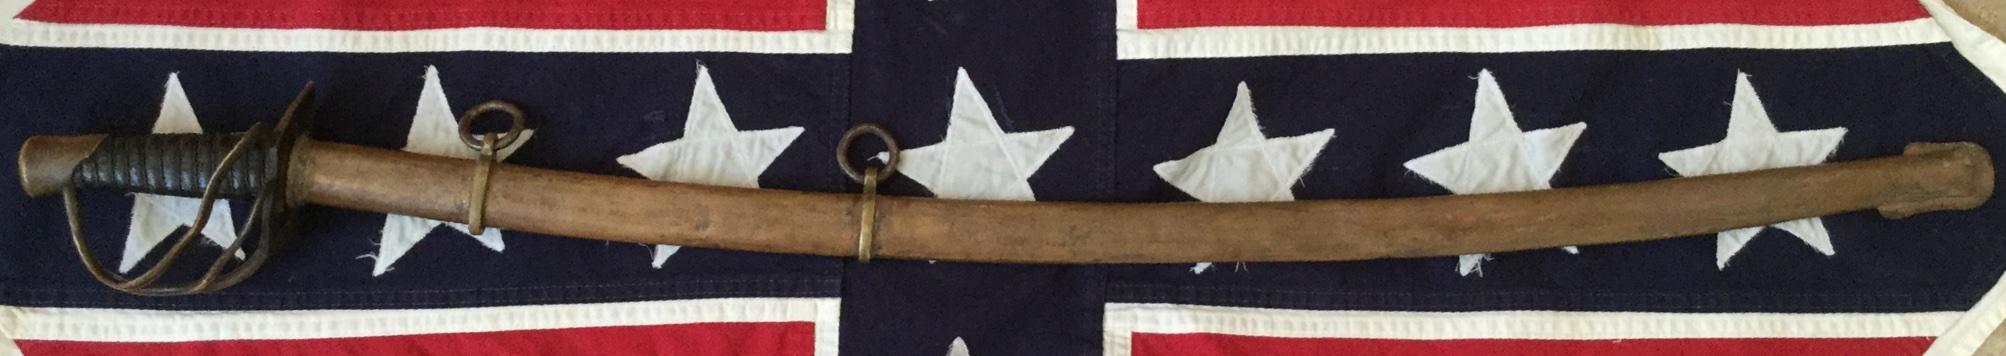 Enlisted Men's Cavalry, 2nd Model Kenansville Sword